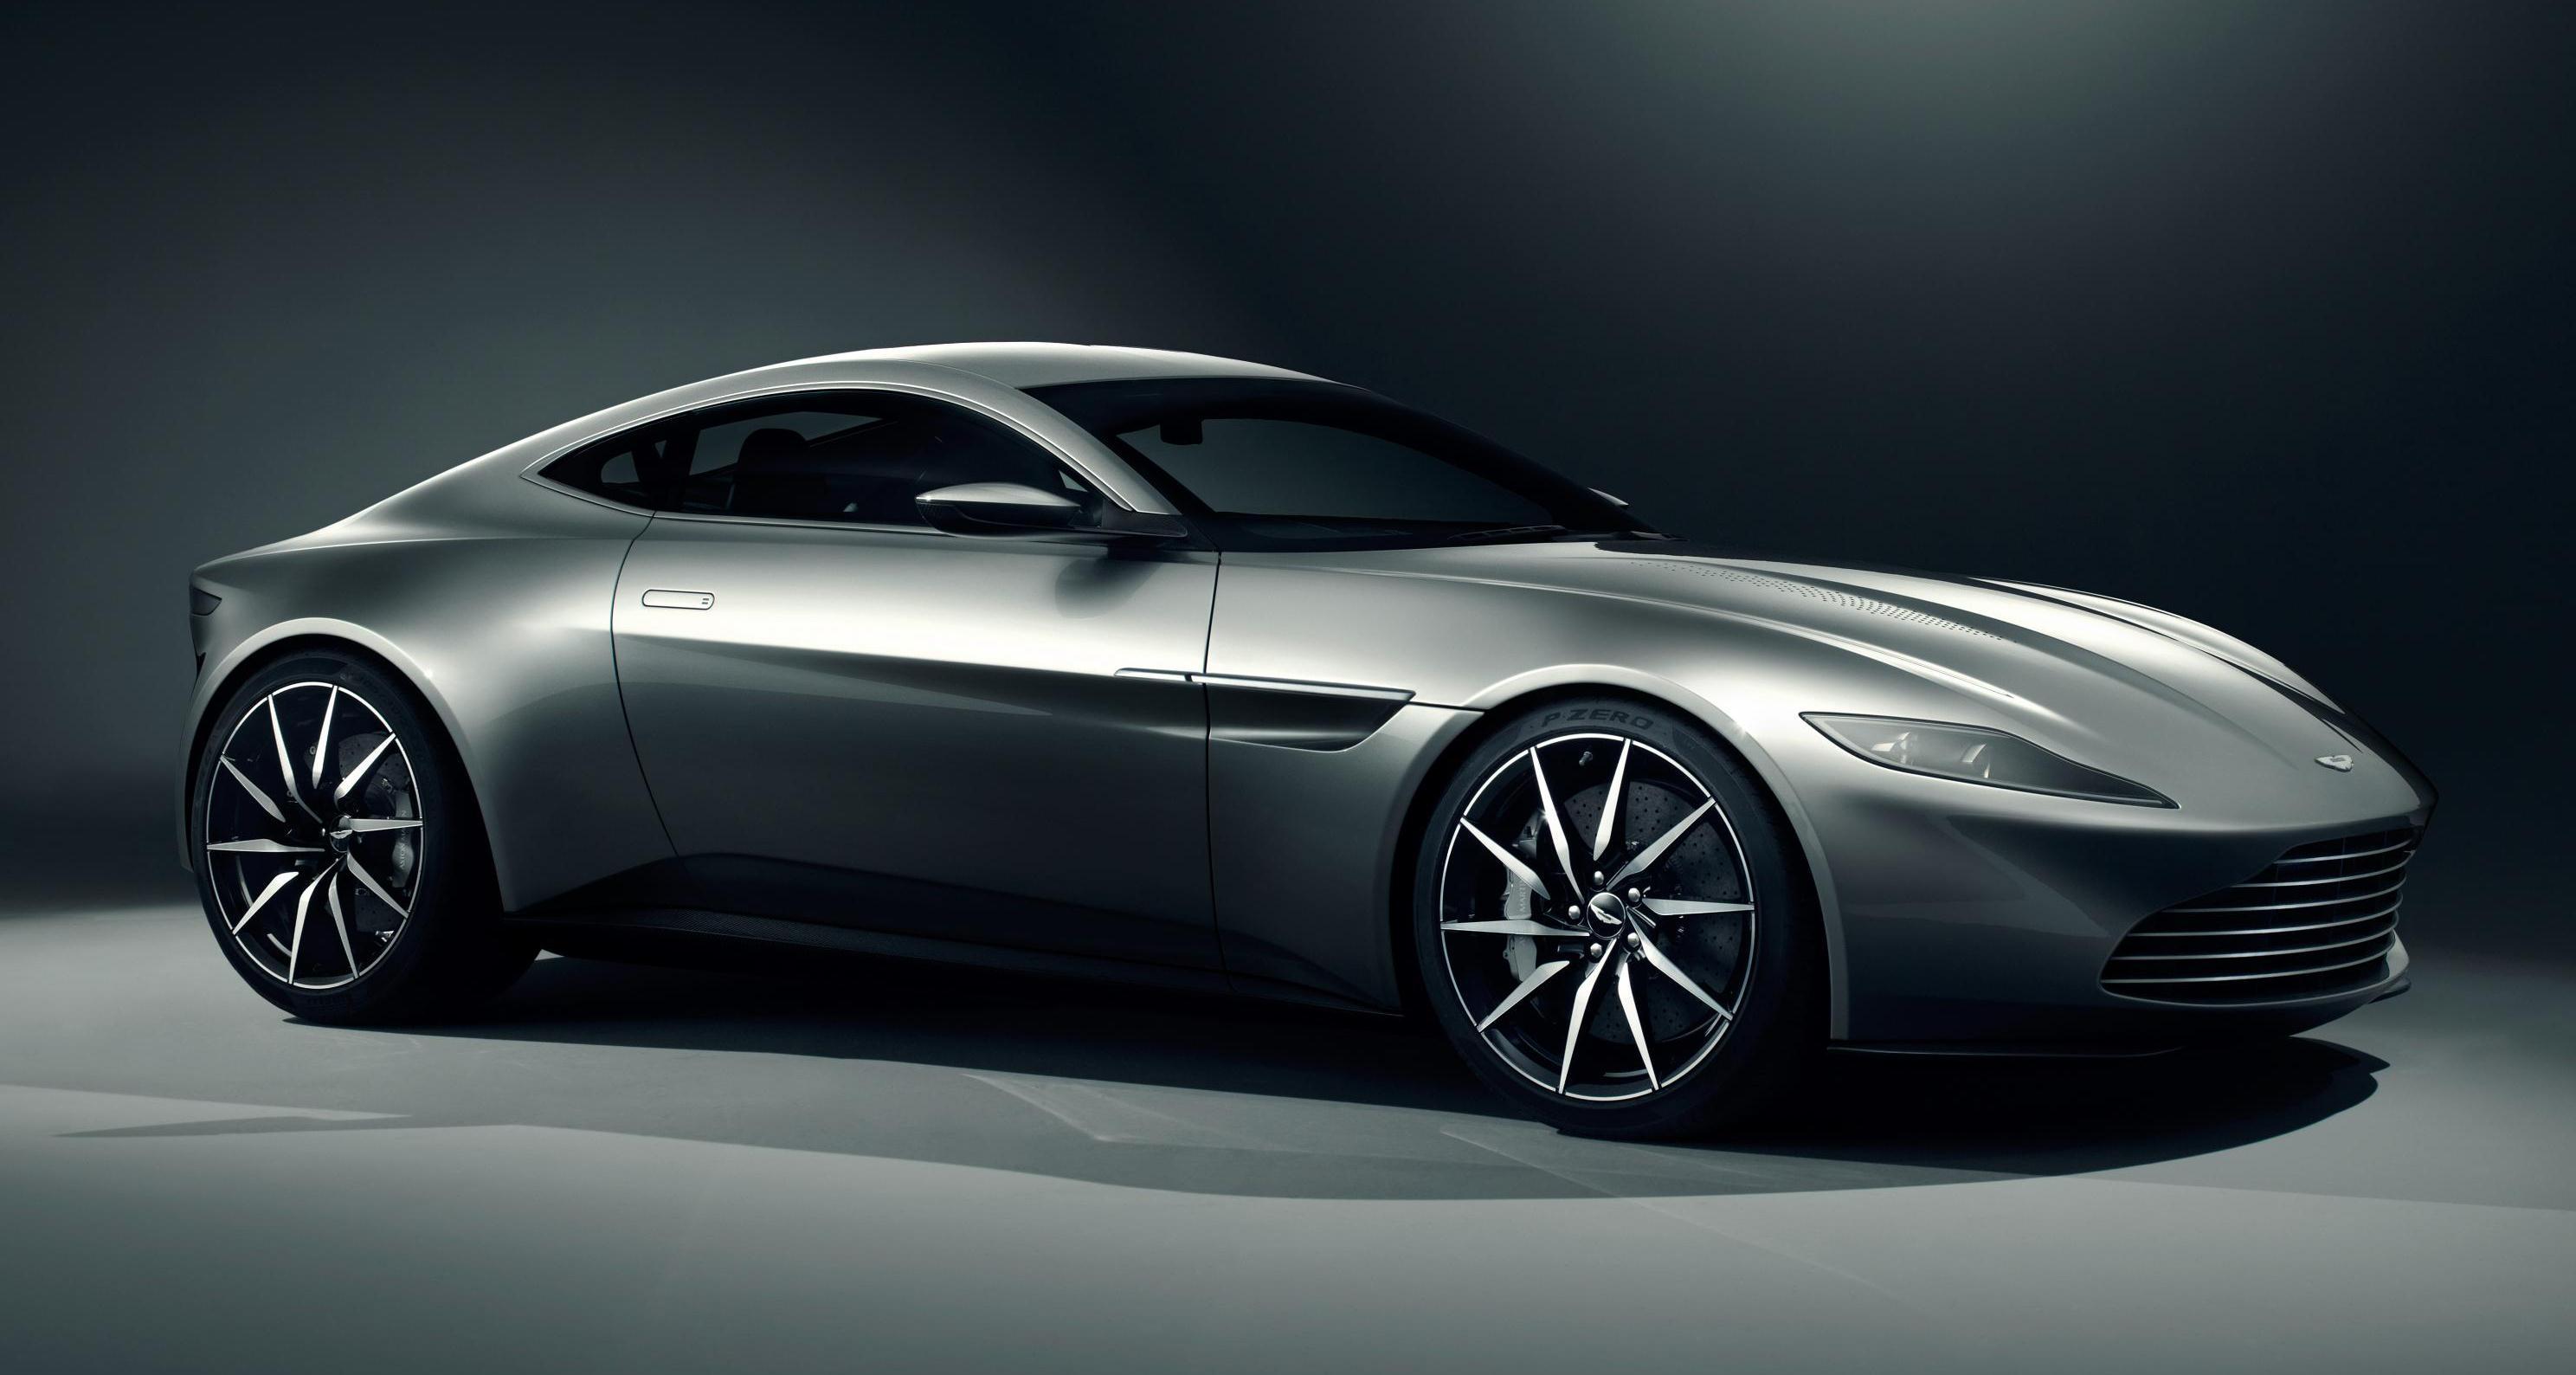 Aston Martin DB10 James Bond - Spectre